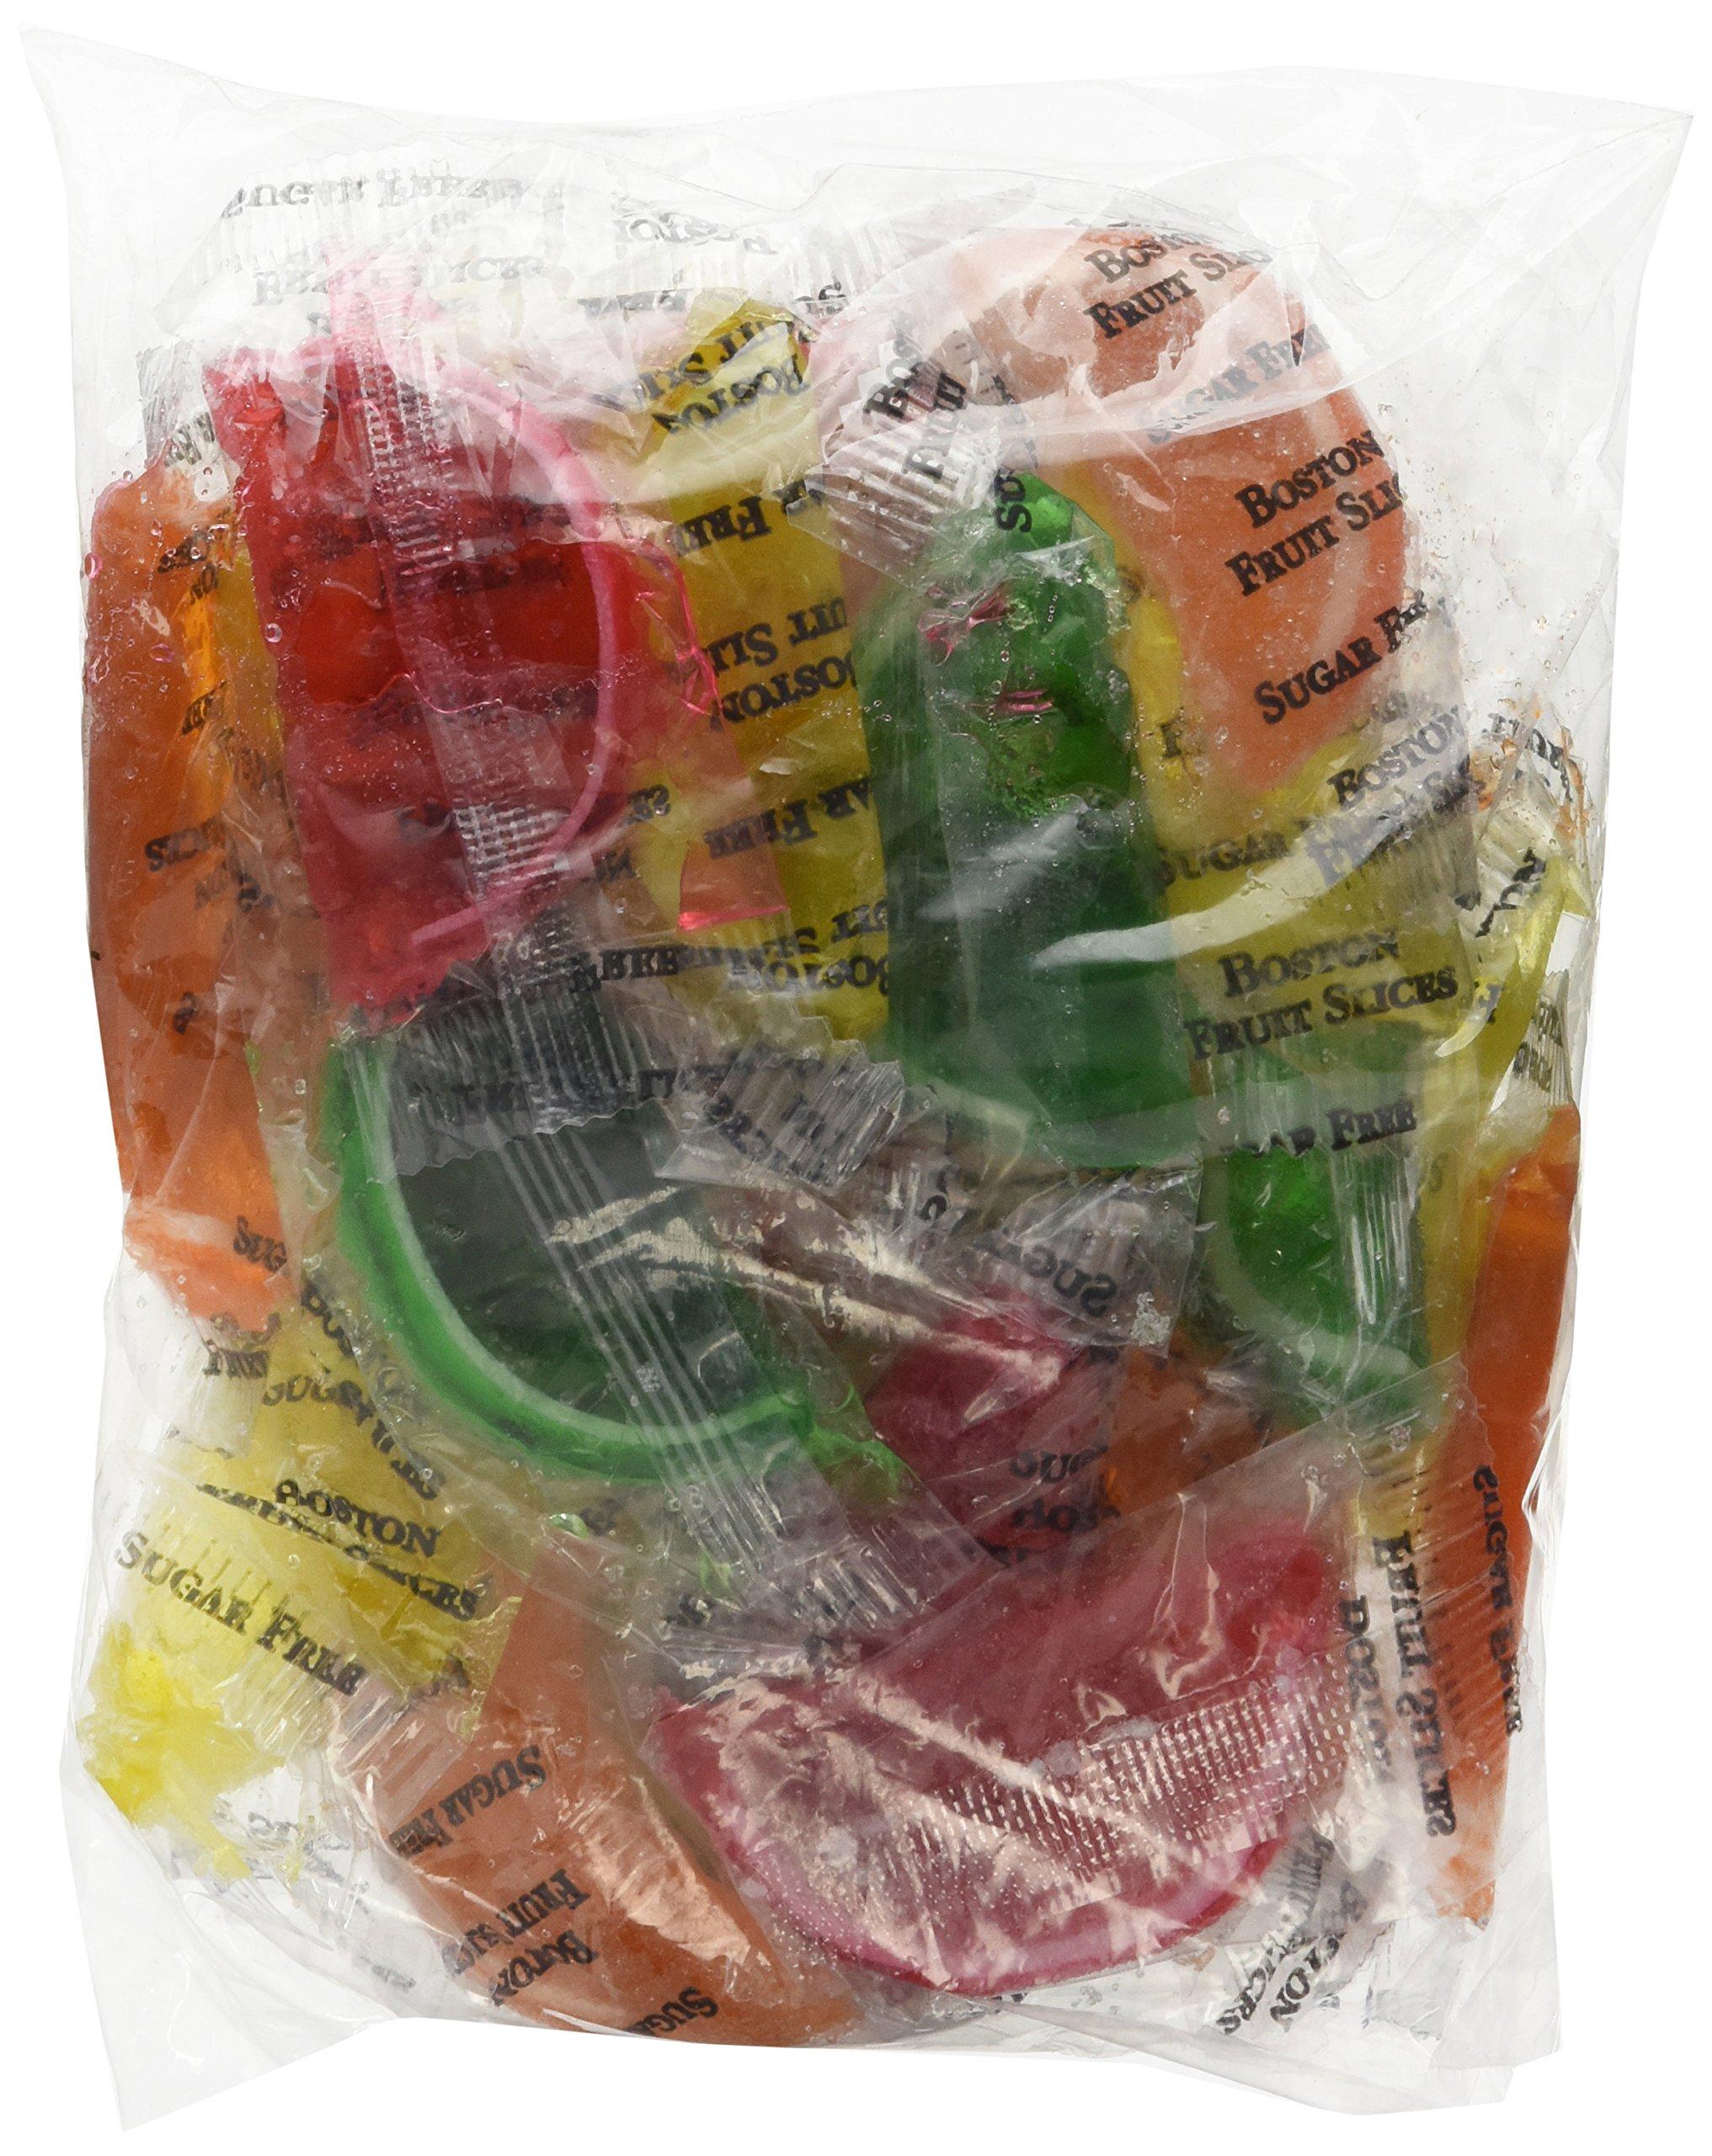 DiabeticFriendly Sugar Free Assorted Fruit Fruit Slices, Orange, Cherry, Lime & Lemon, Individually Wrapped, 1lb Bag